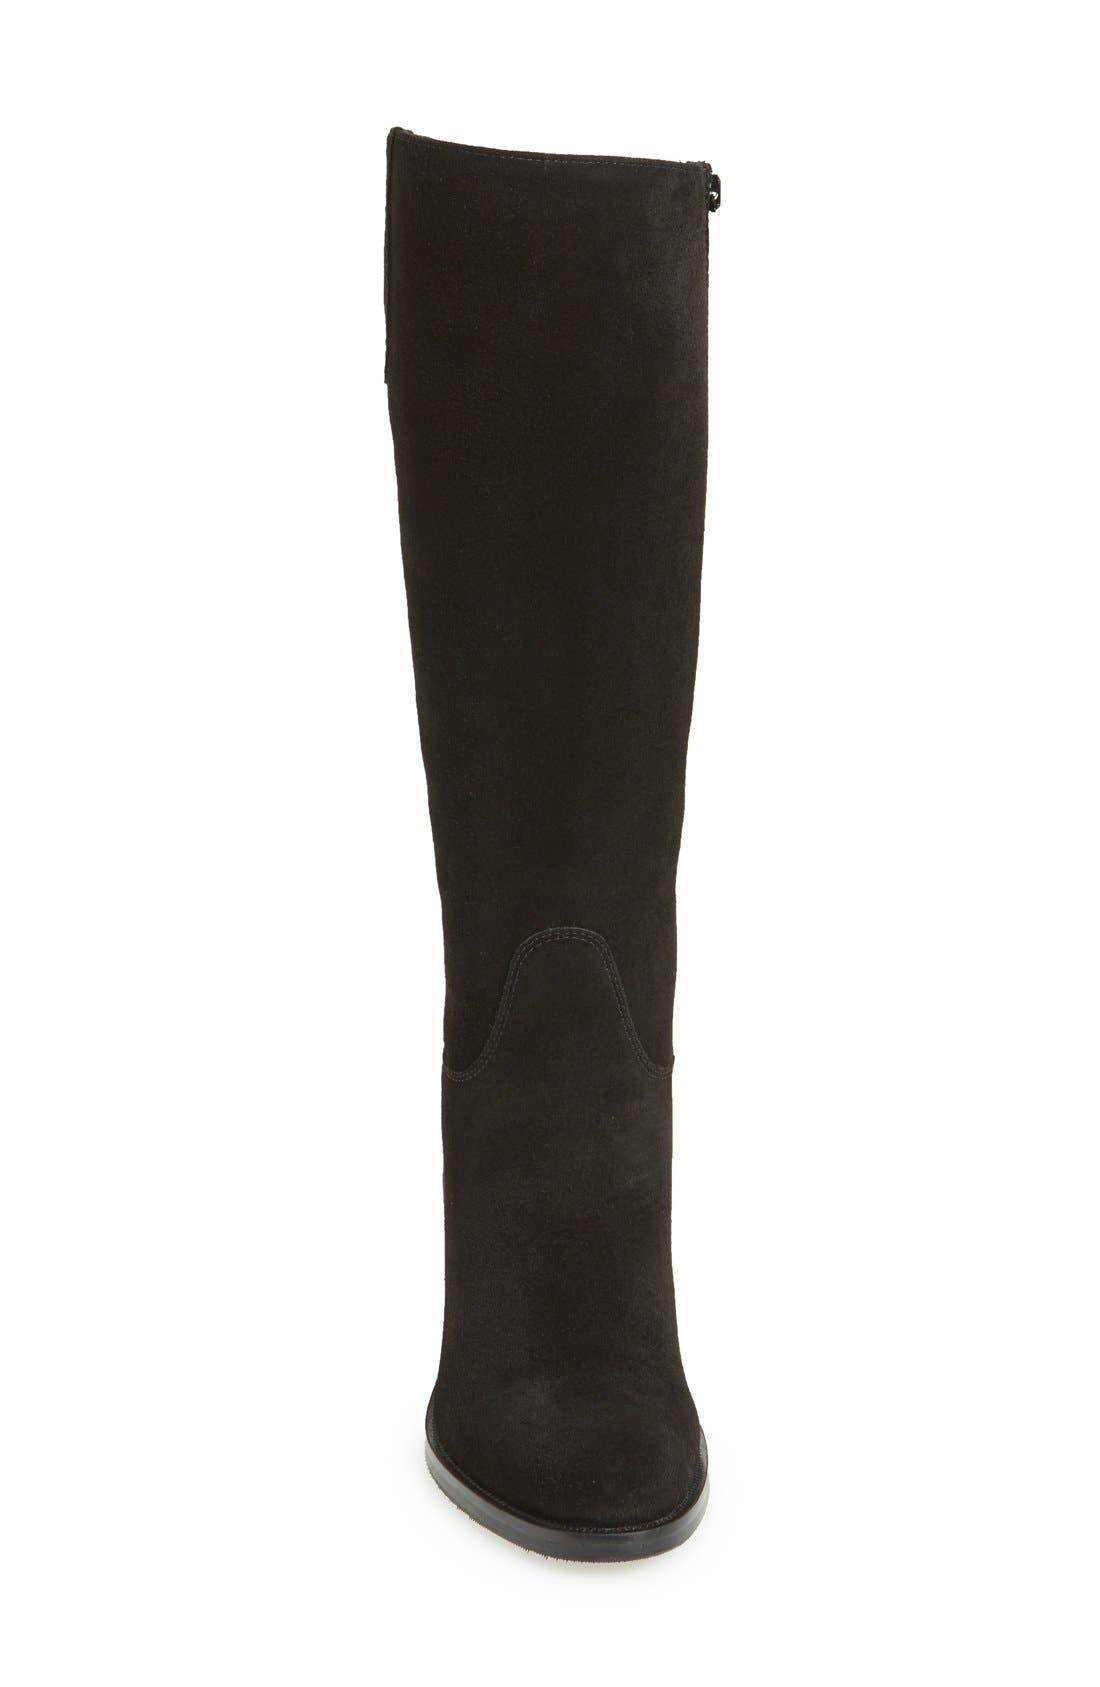 'Polly' Waterproof Knee High Boot,                             Alternate thumbnail 3, color,                             BLACK SUEDE